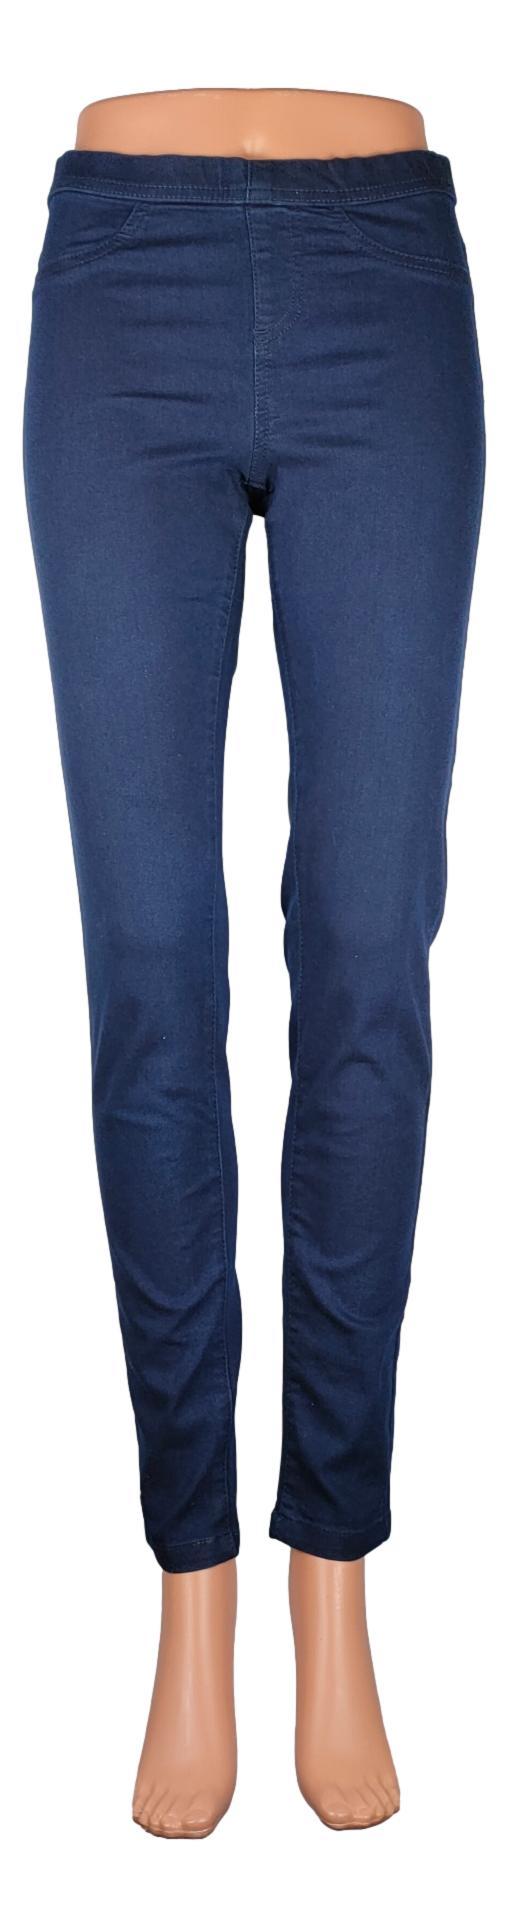 Pantalon MIM - Taille 36